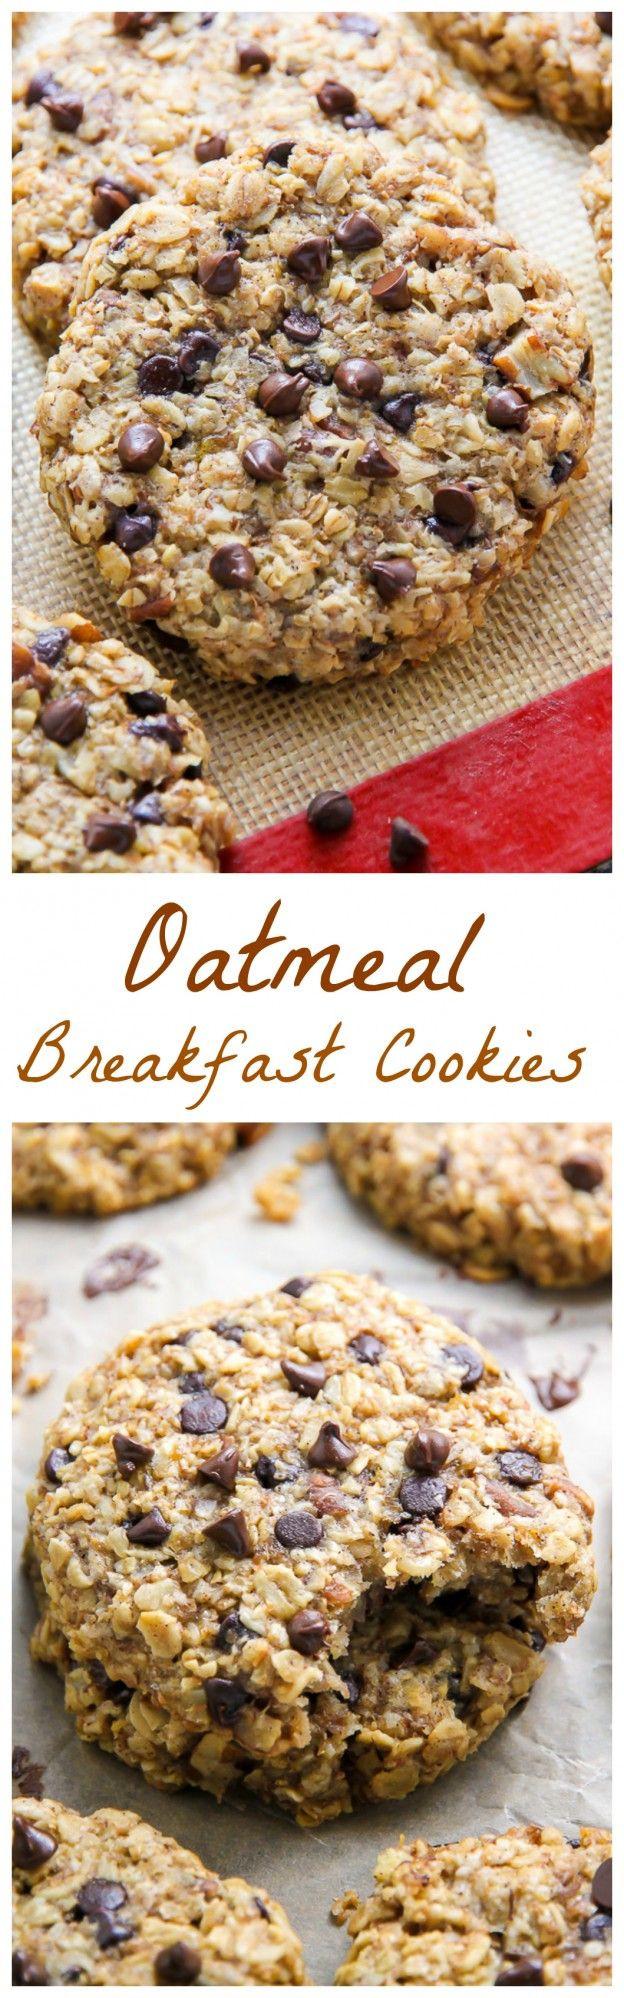 High Fiber Breakfast Recipes  Top 25 best High fiber recipes ideas on Pinterest